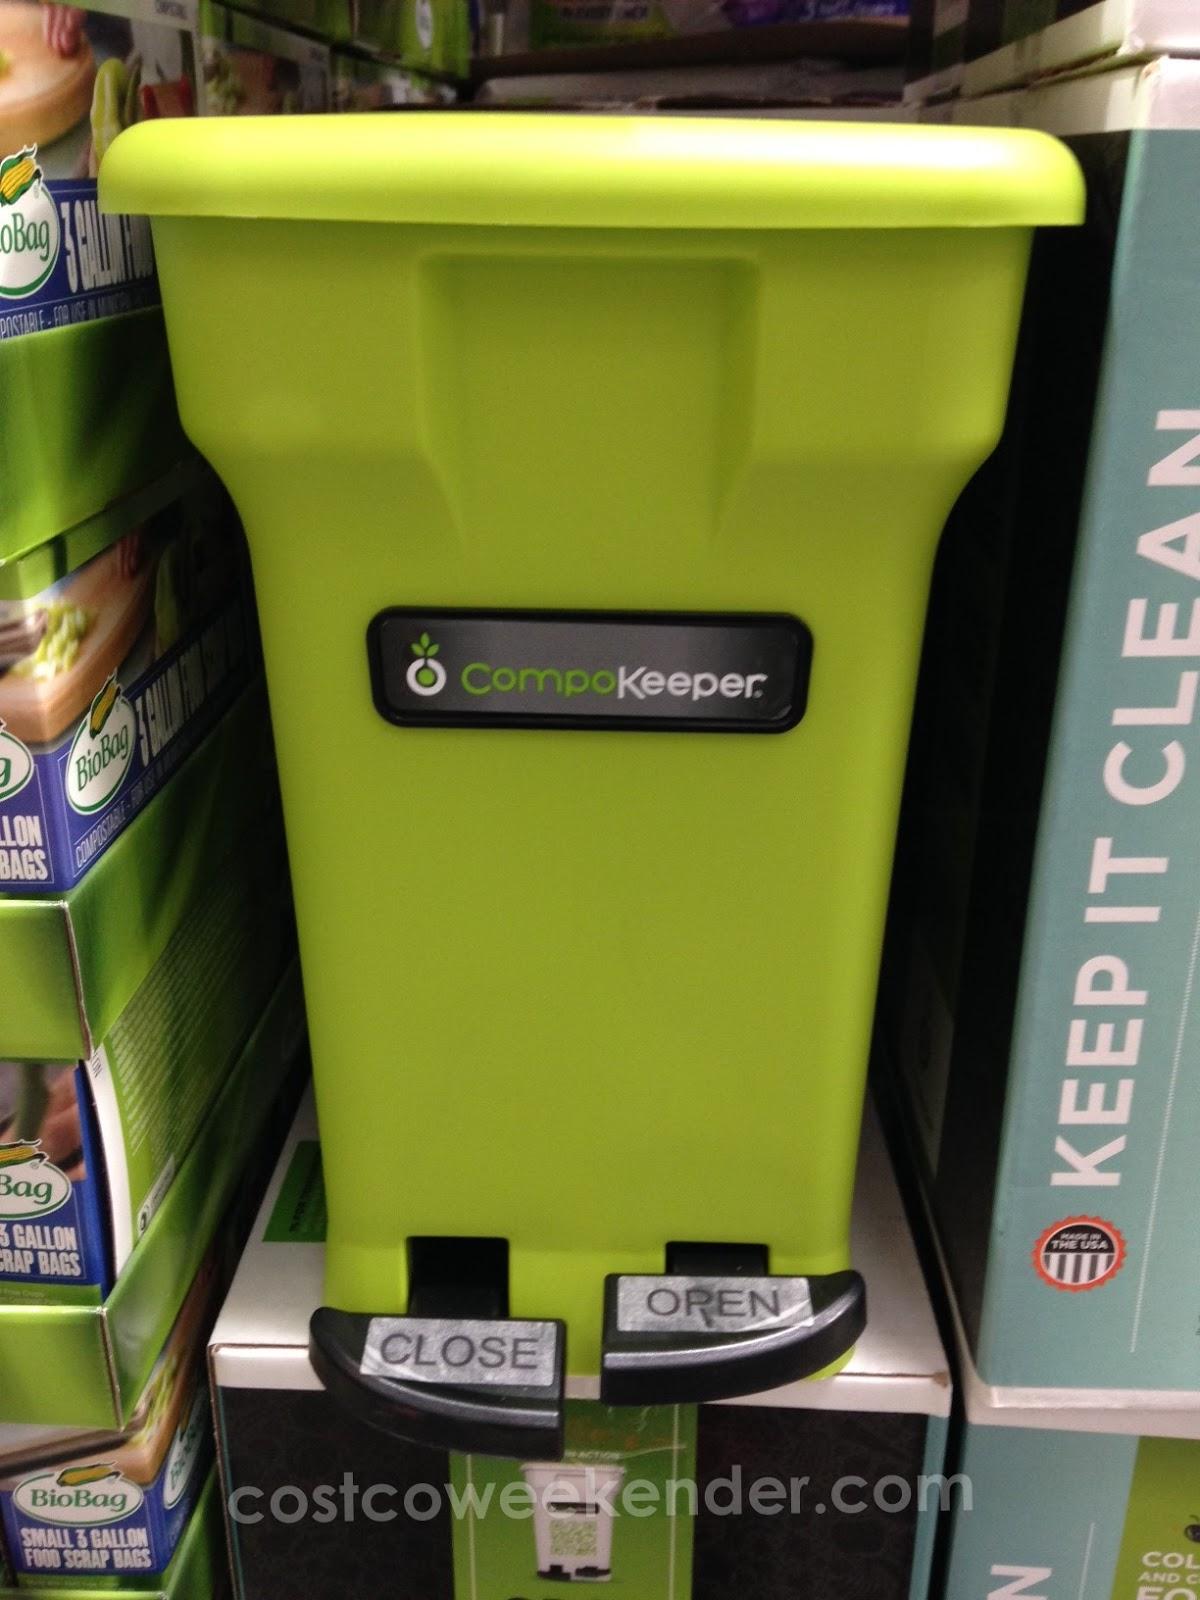 put away food scraps in the keep in clean compokeeper food waste bin